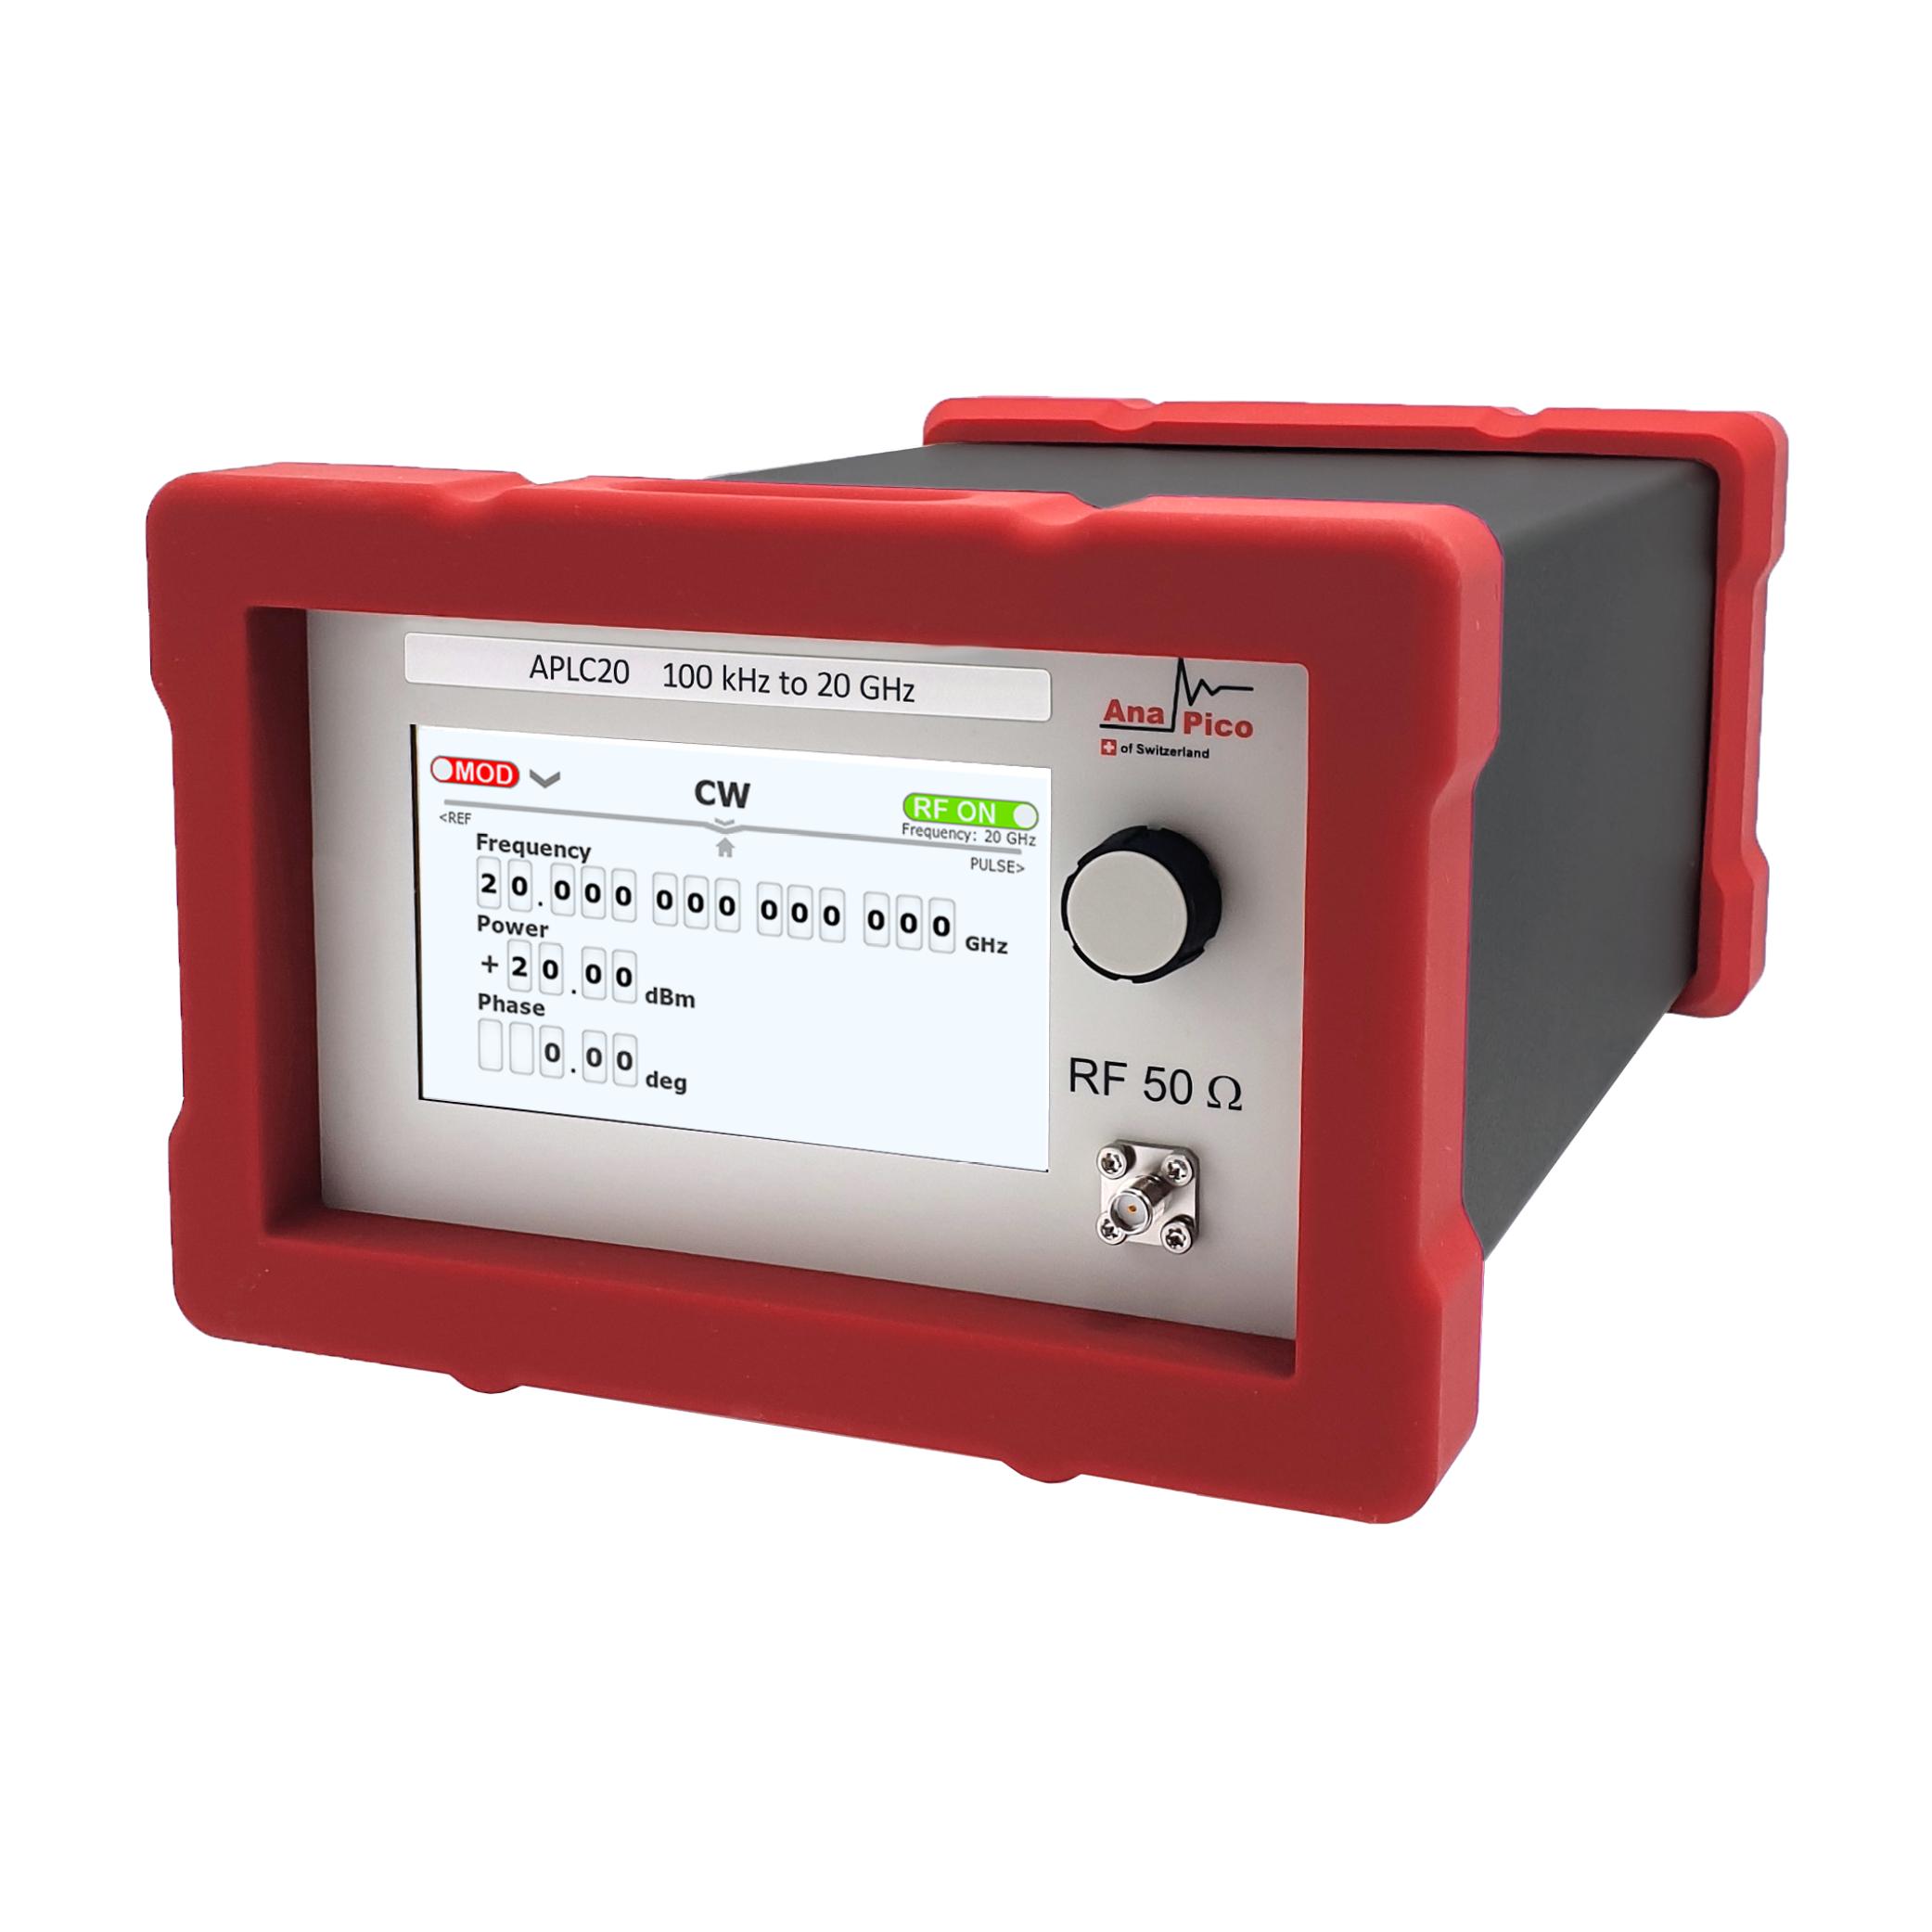 anapico-agile-ultra-low-phase-noise-signal-generator